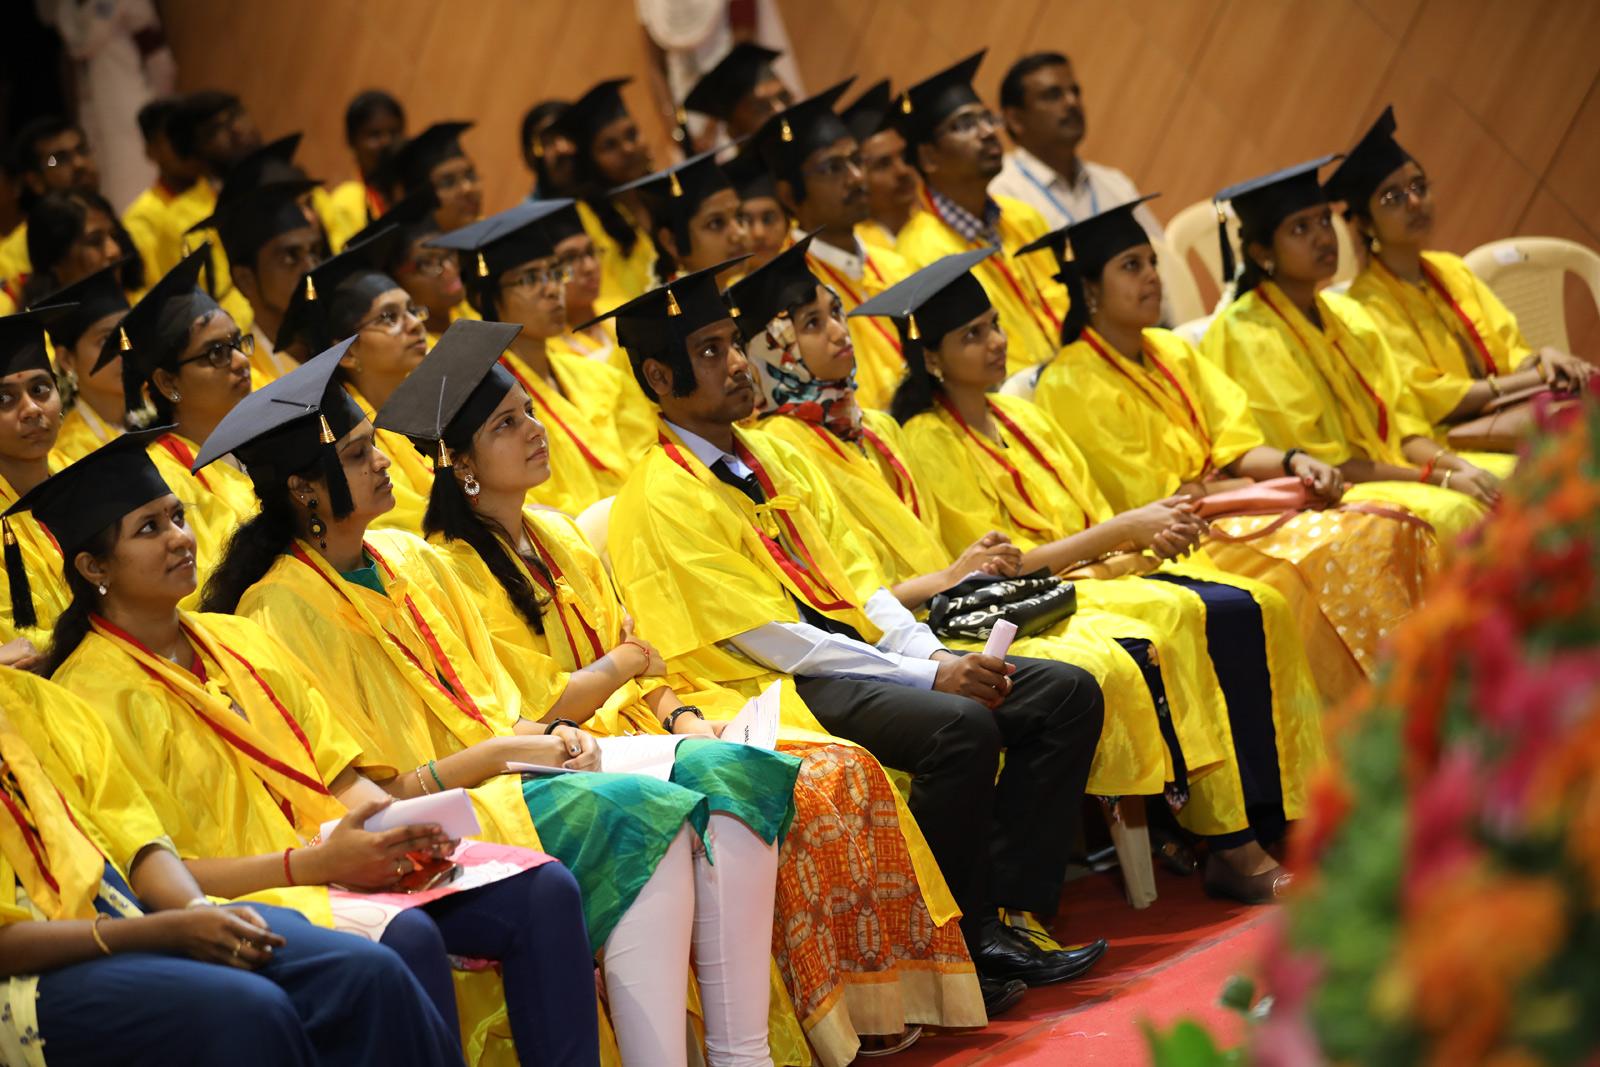 Graduation day 2019, Sona College of Technology, Salem, Tamilnadu, India  SONA College of